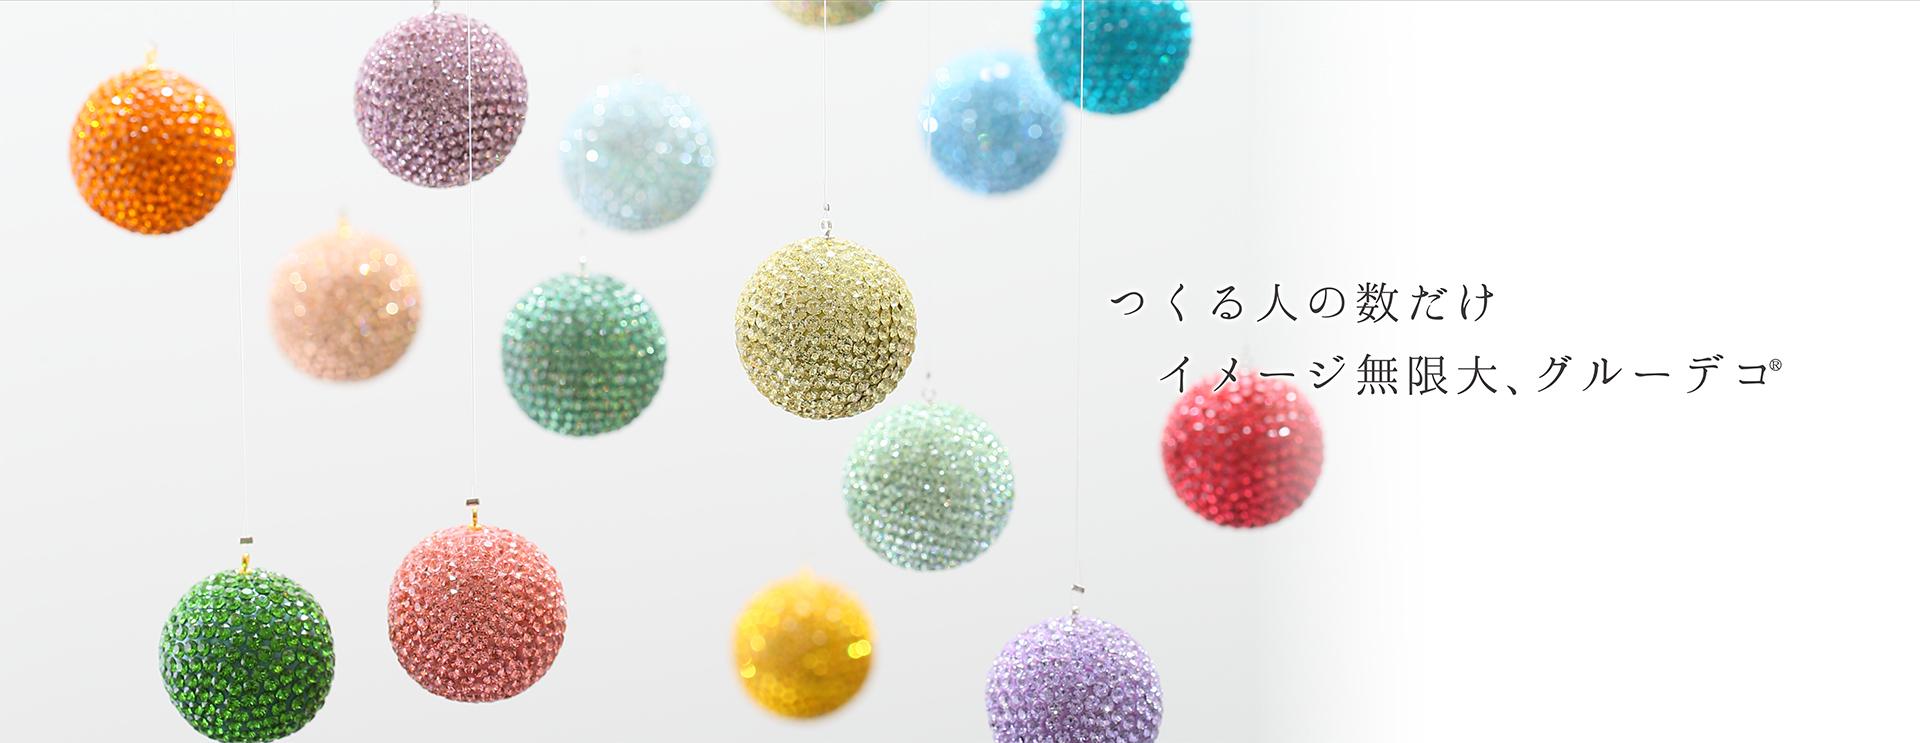 wGlue Japanイメージ4